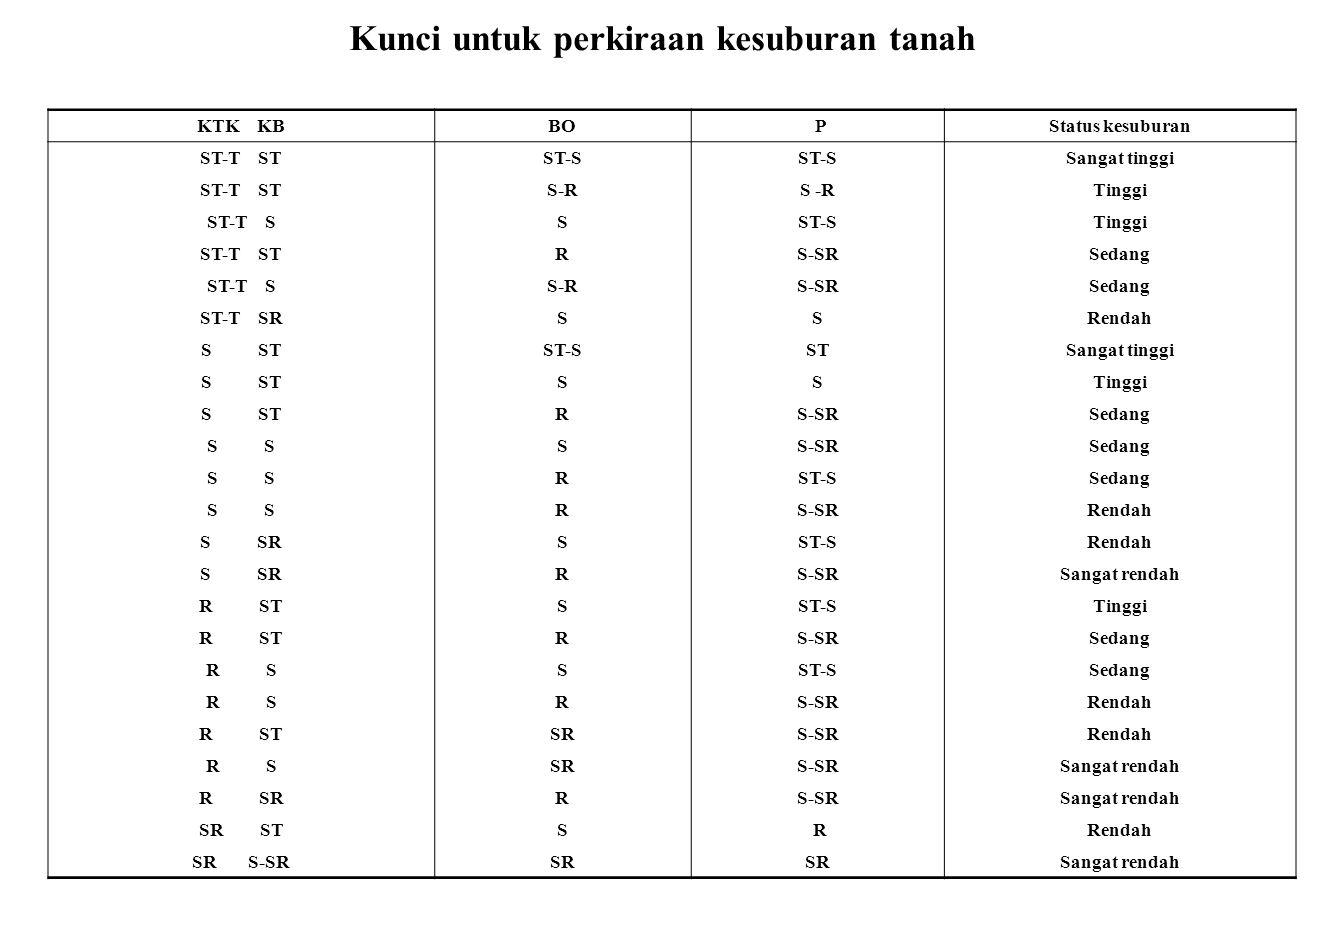 Kunci untuk perkiraan kesuburan tanah KTK KBBO PStatus kesuburan ST-T STST-S Sangat tinggi ST-T STS-R Tinggi ST-T SSST-STinggi ST-T STRS-SRSedang ST-T